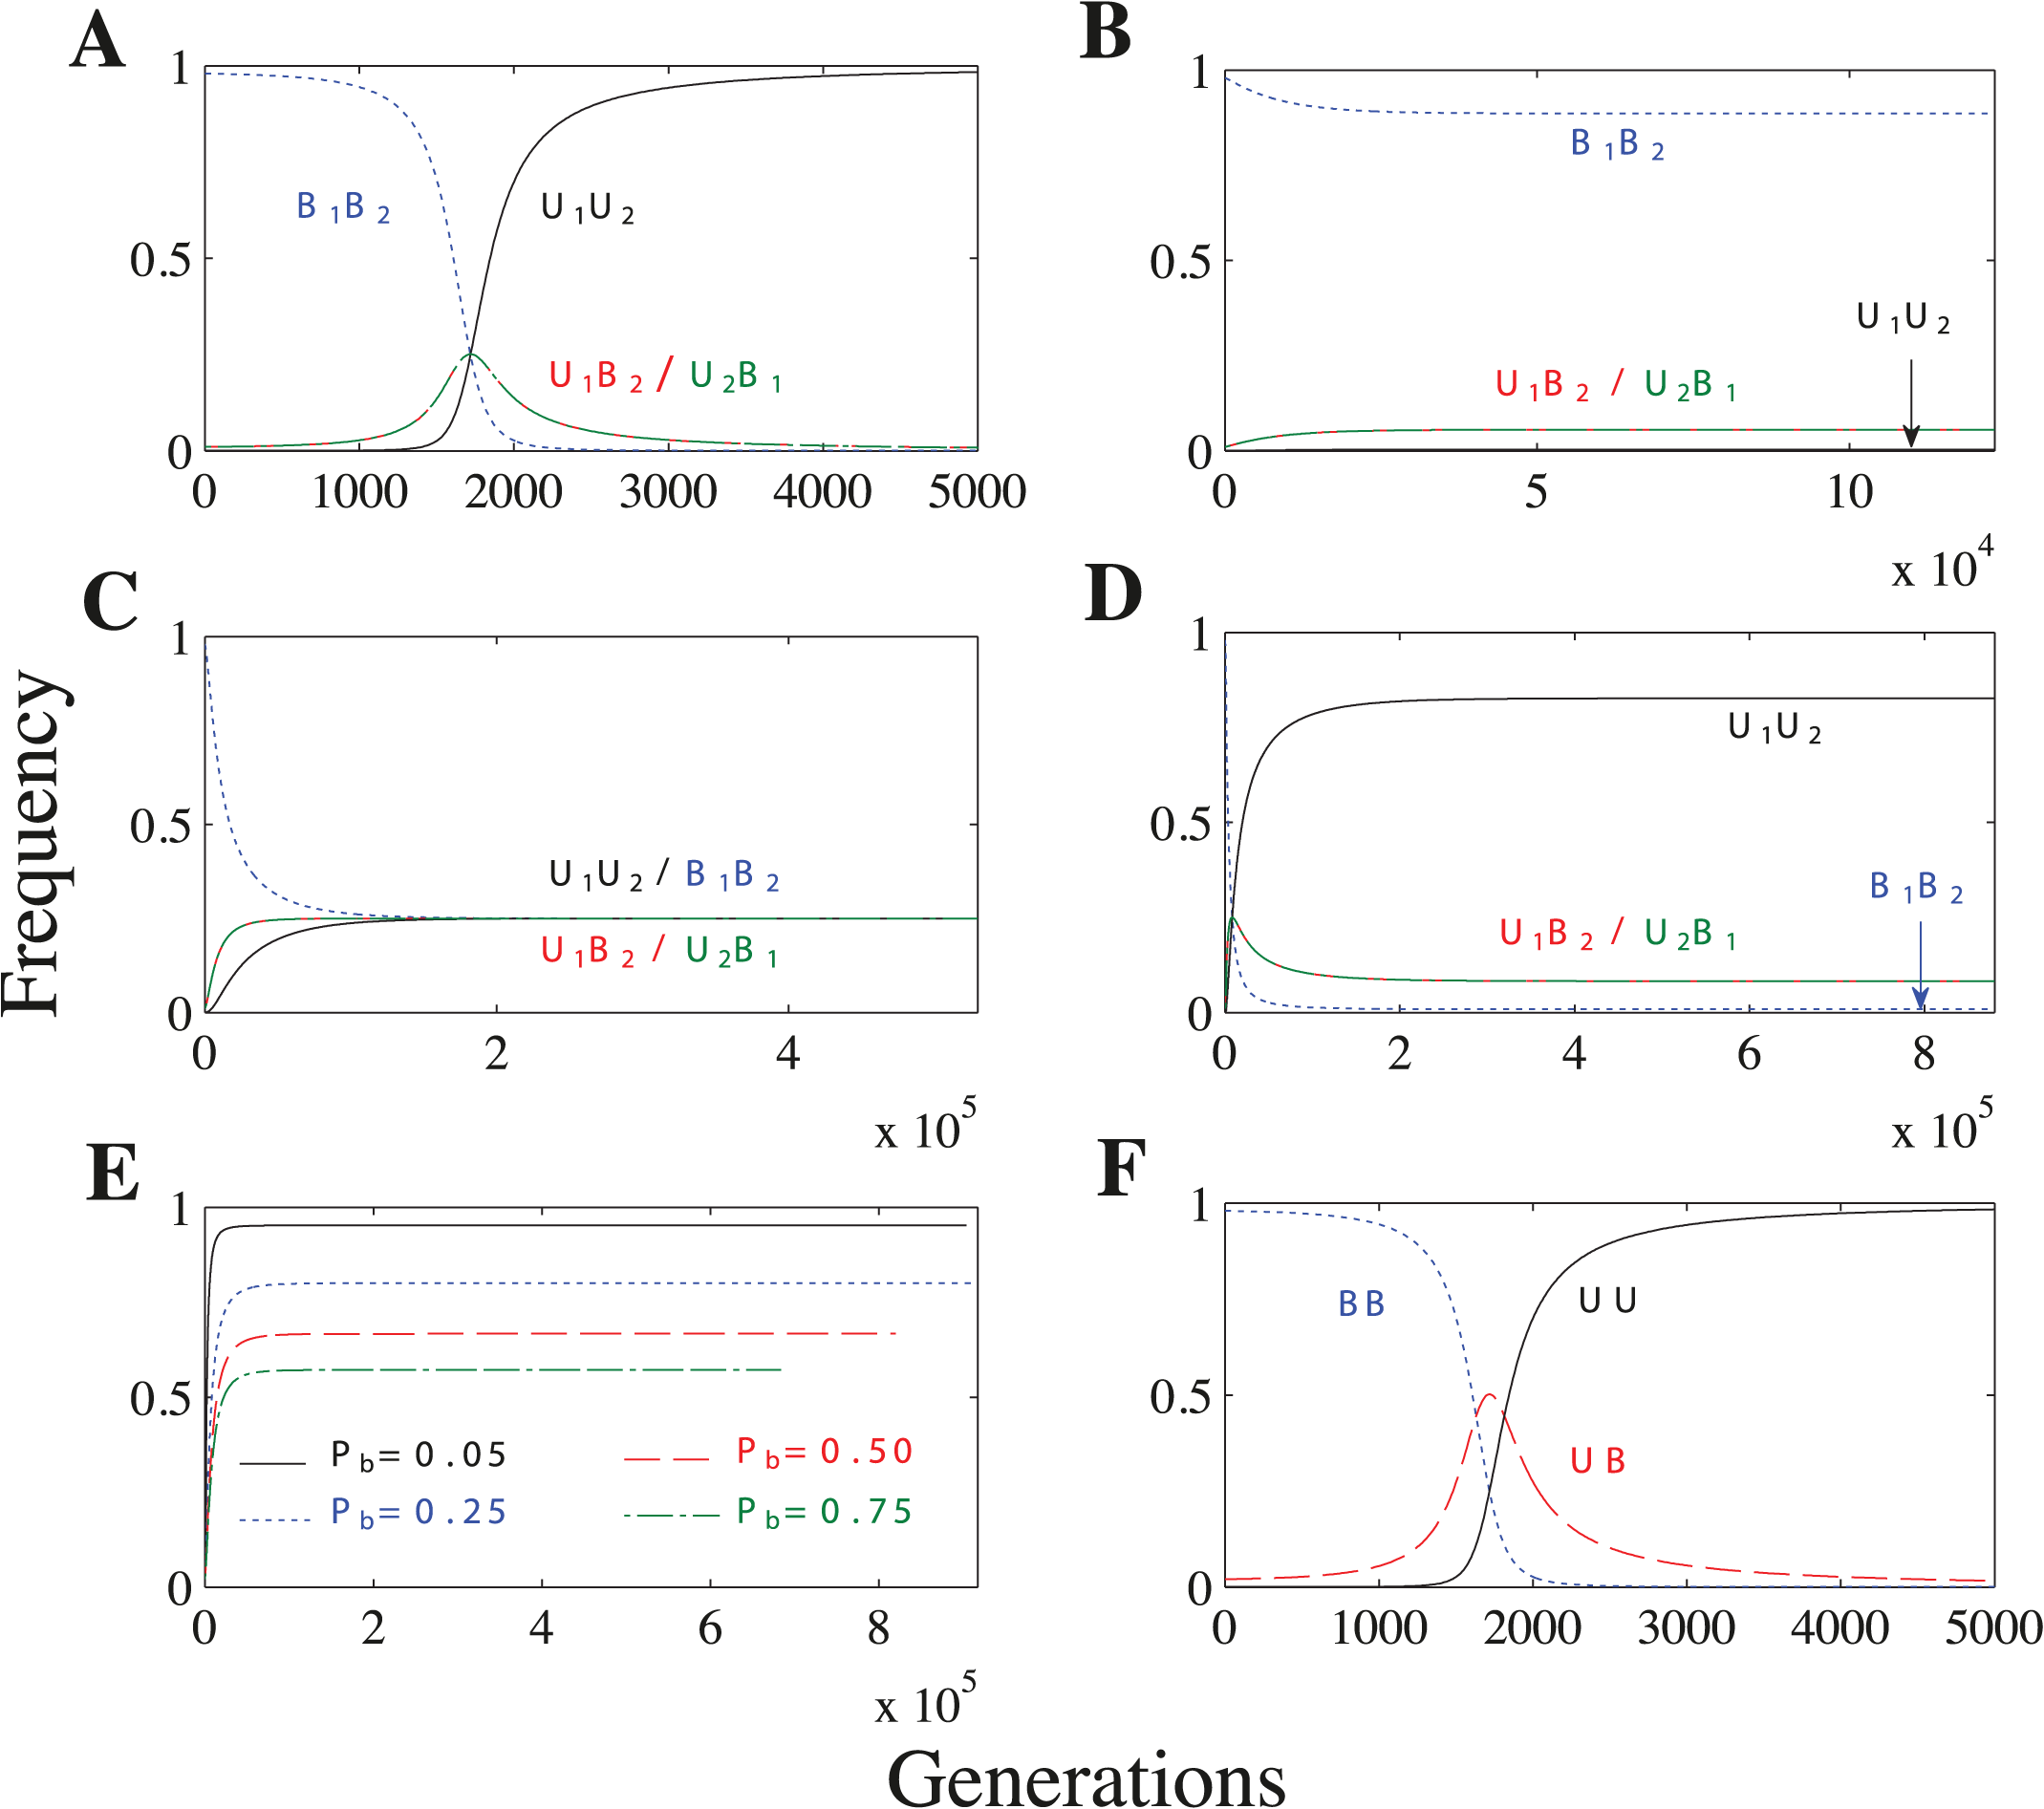 Recombination and no mating types scenarios.